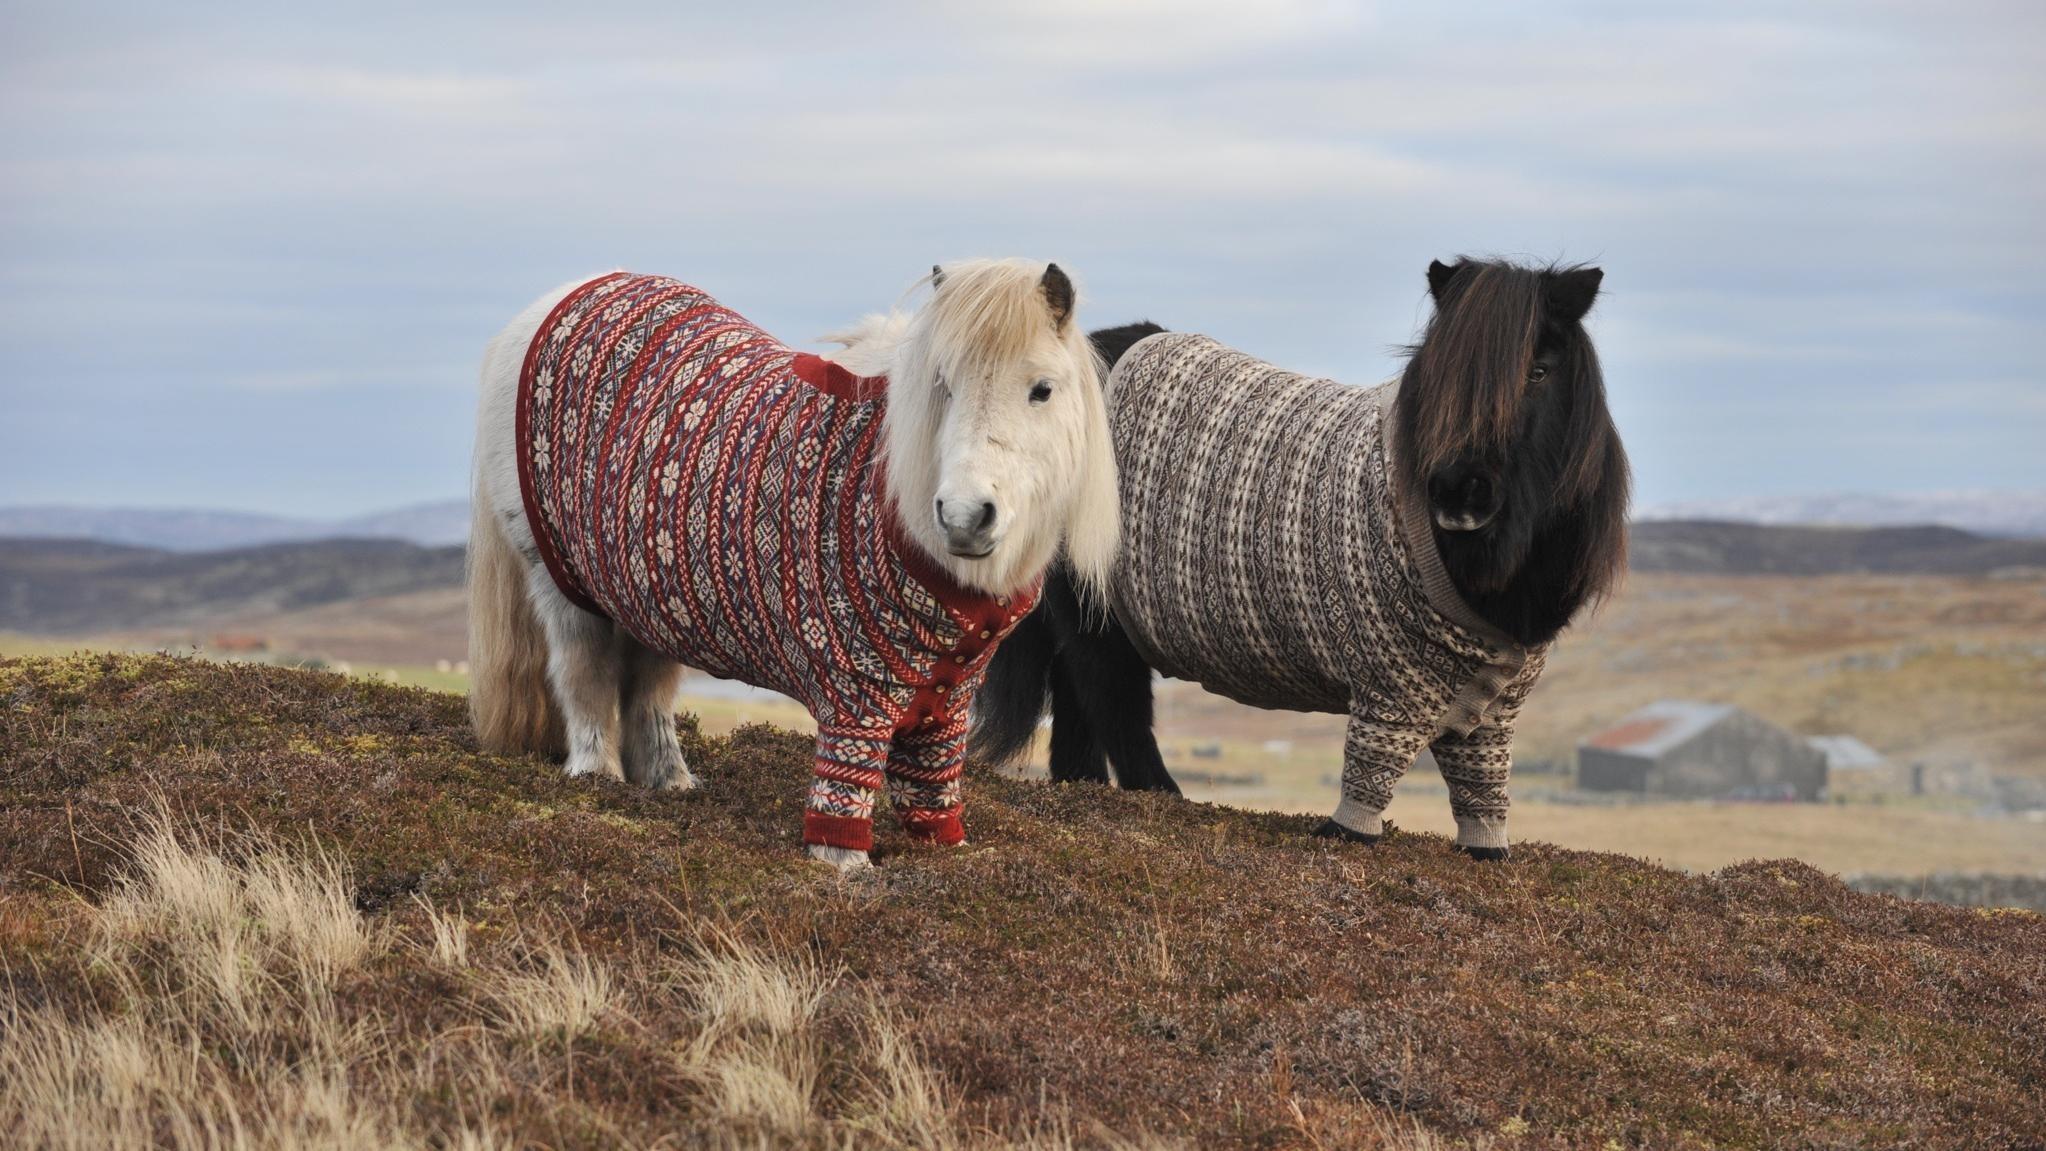 Scottish Ponies Wearing Cardigans? Scottish Ponies Wearing Cardigans.